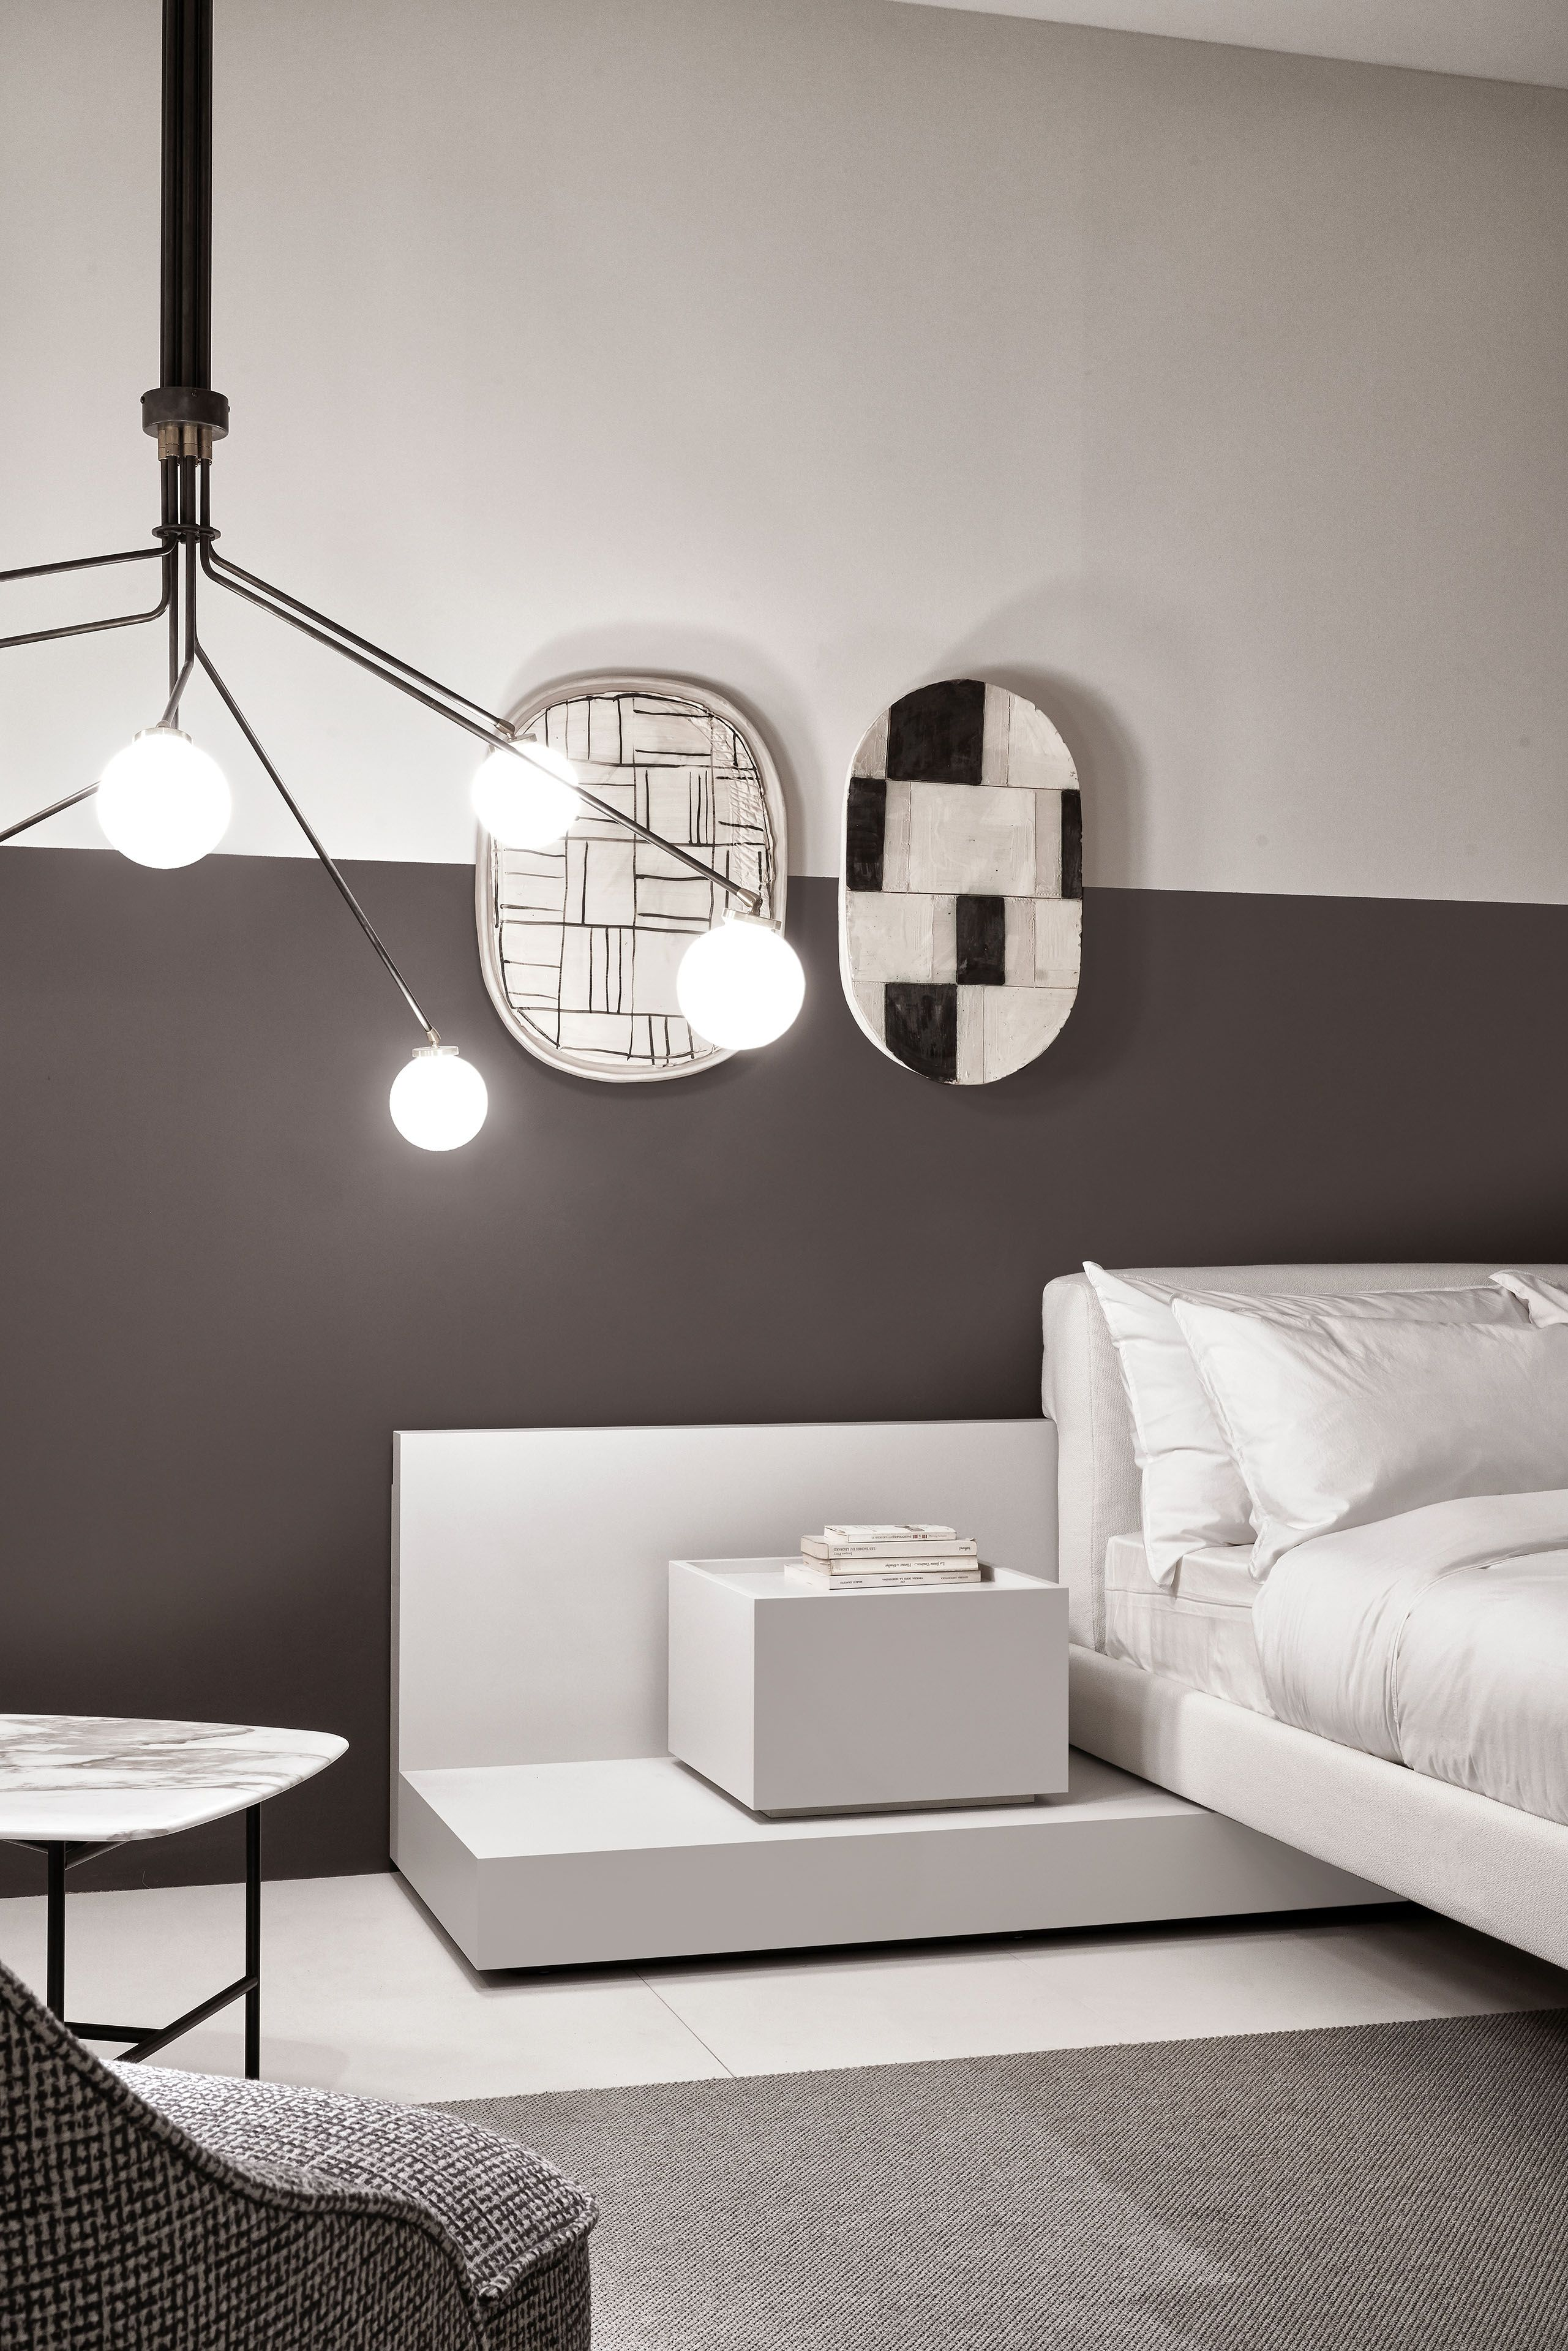 Cliff Modular Bed For Info Contact Furniturerepublicltd Co Uk